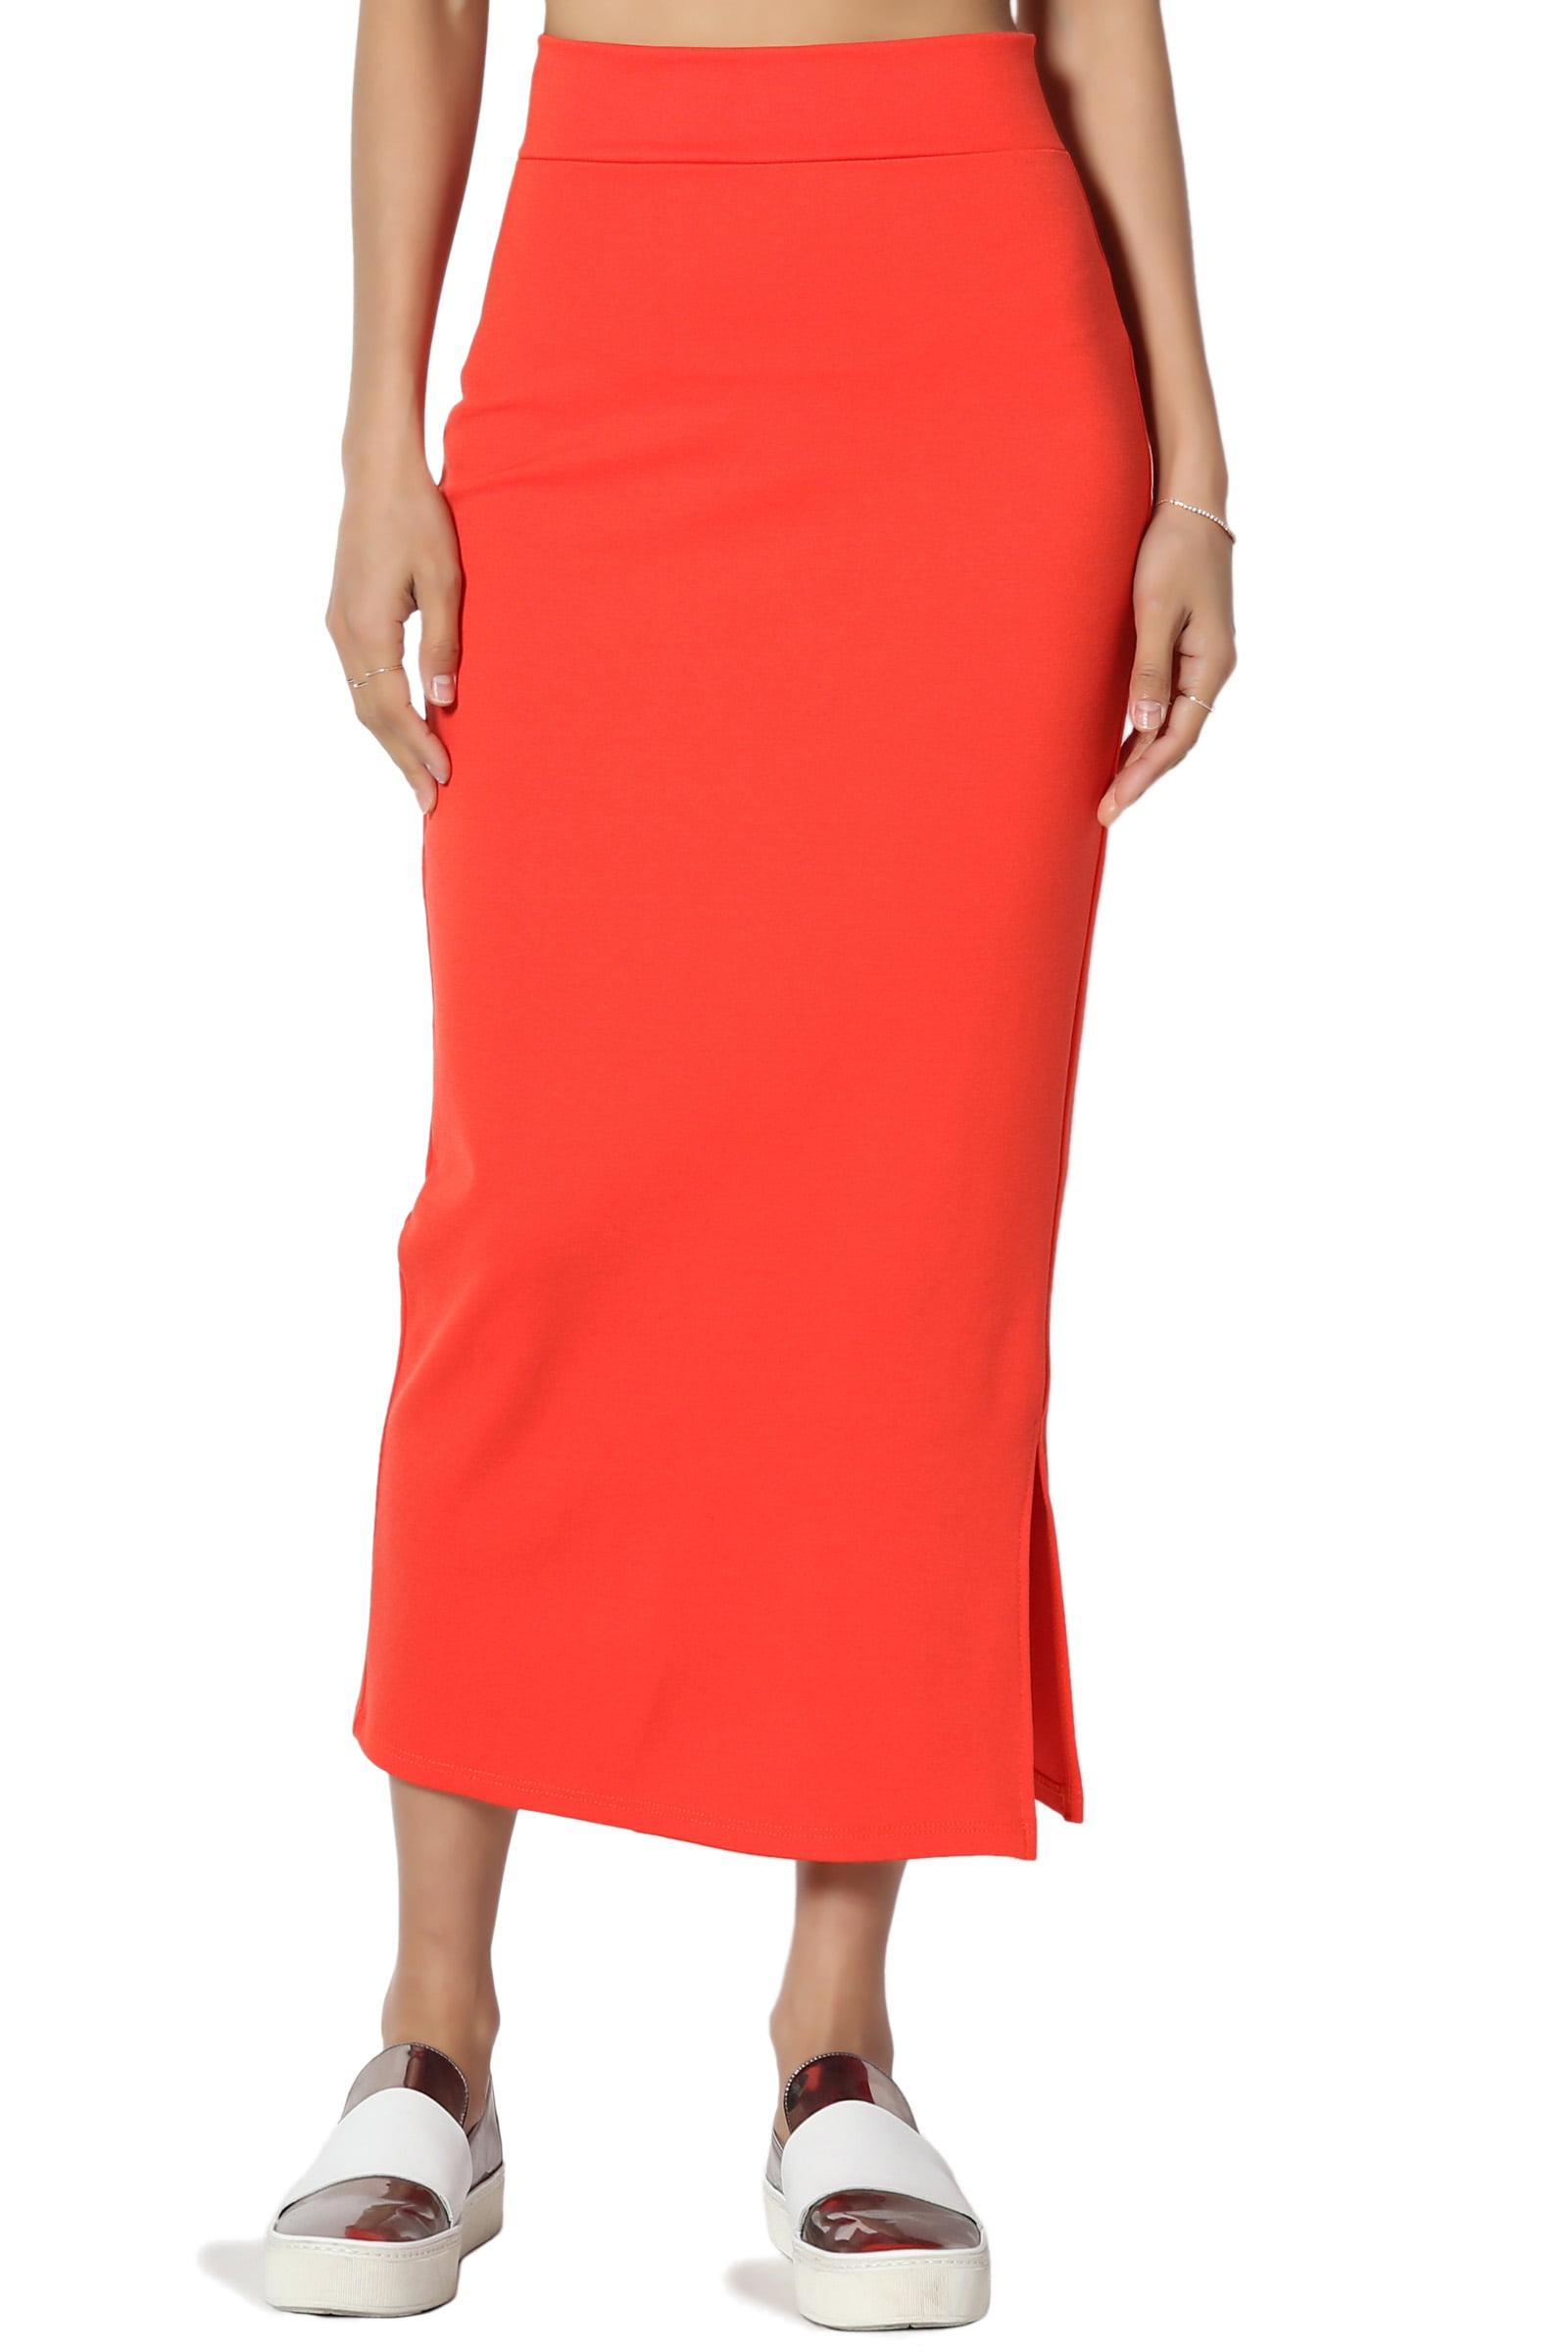 f32a6276de TheMogan - TheMogan Women's S~3X Side Slit Ponte Knit High Waist Mid Calf  Long Pencil Skirt - Walmart.com